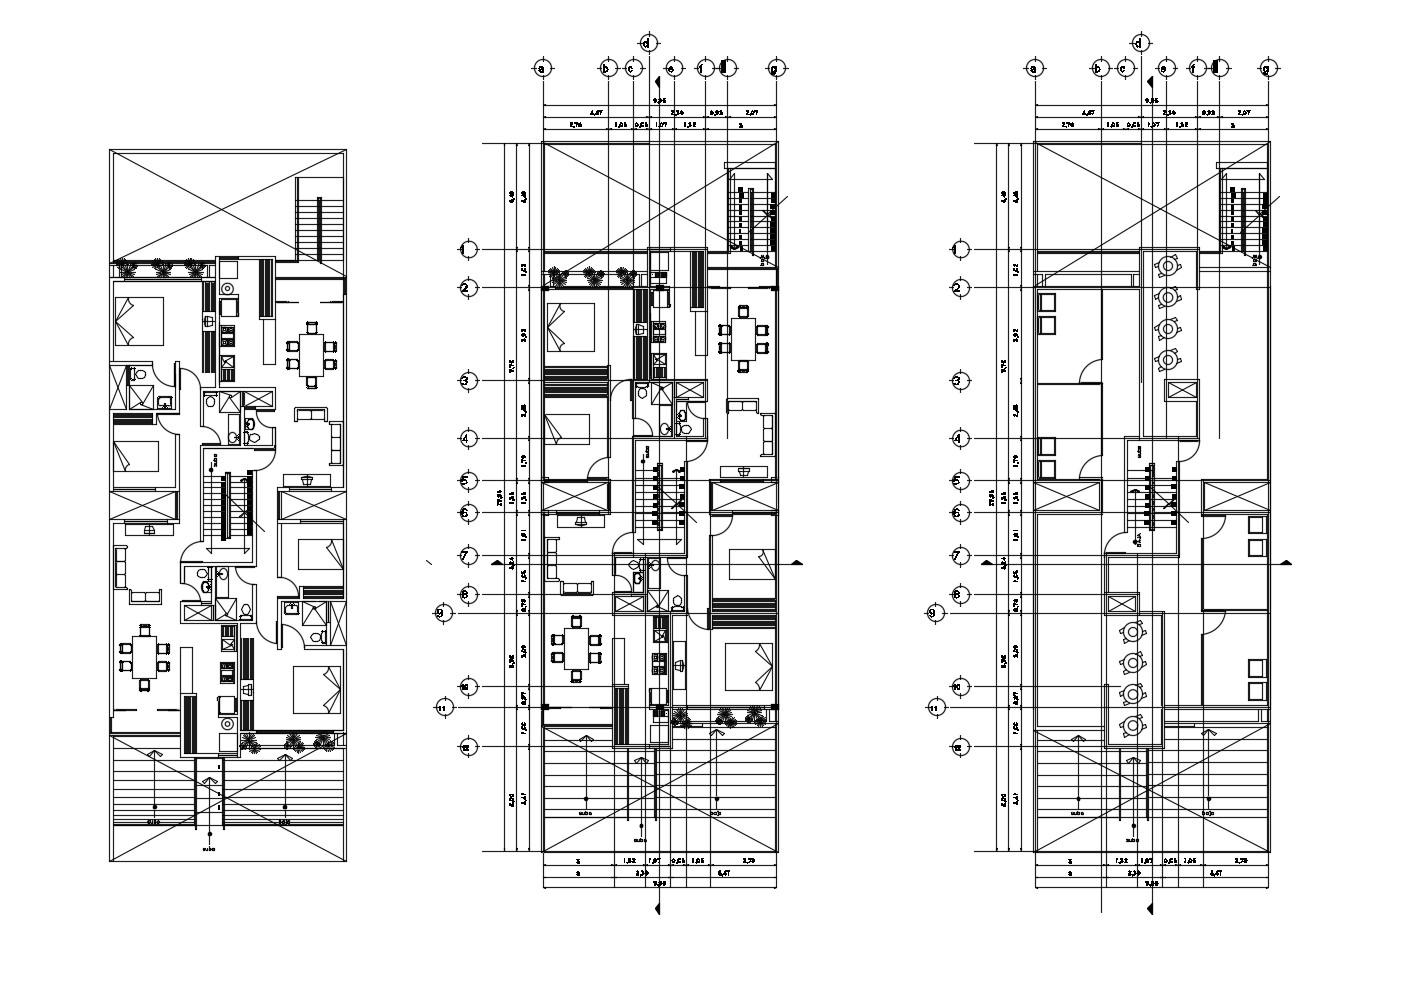 Residential building design plans in DWG file